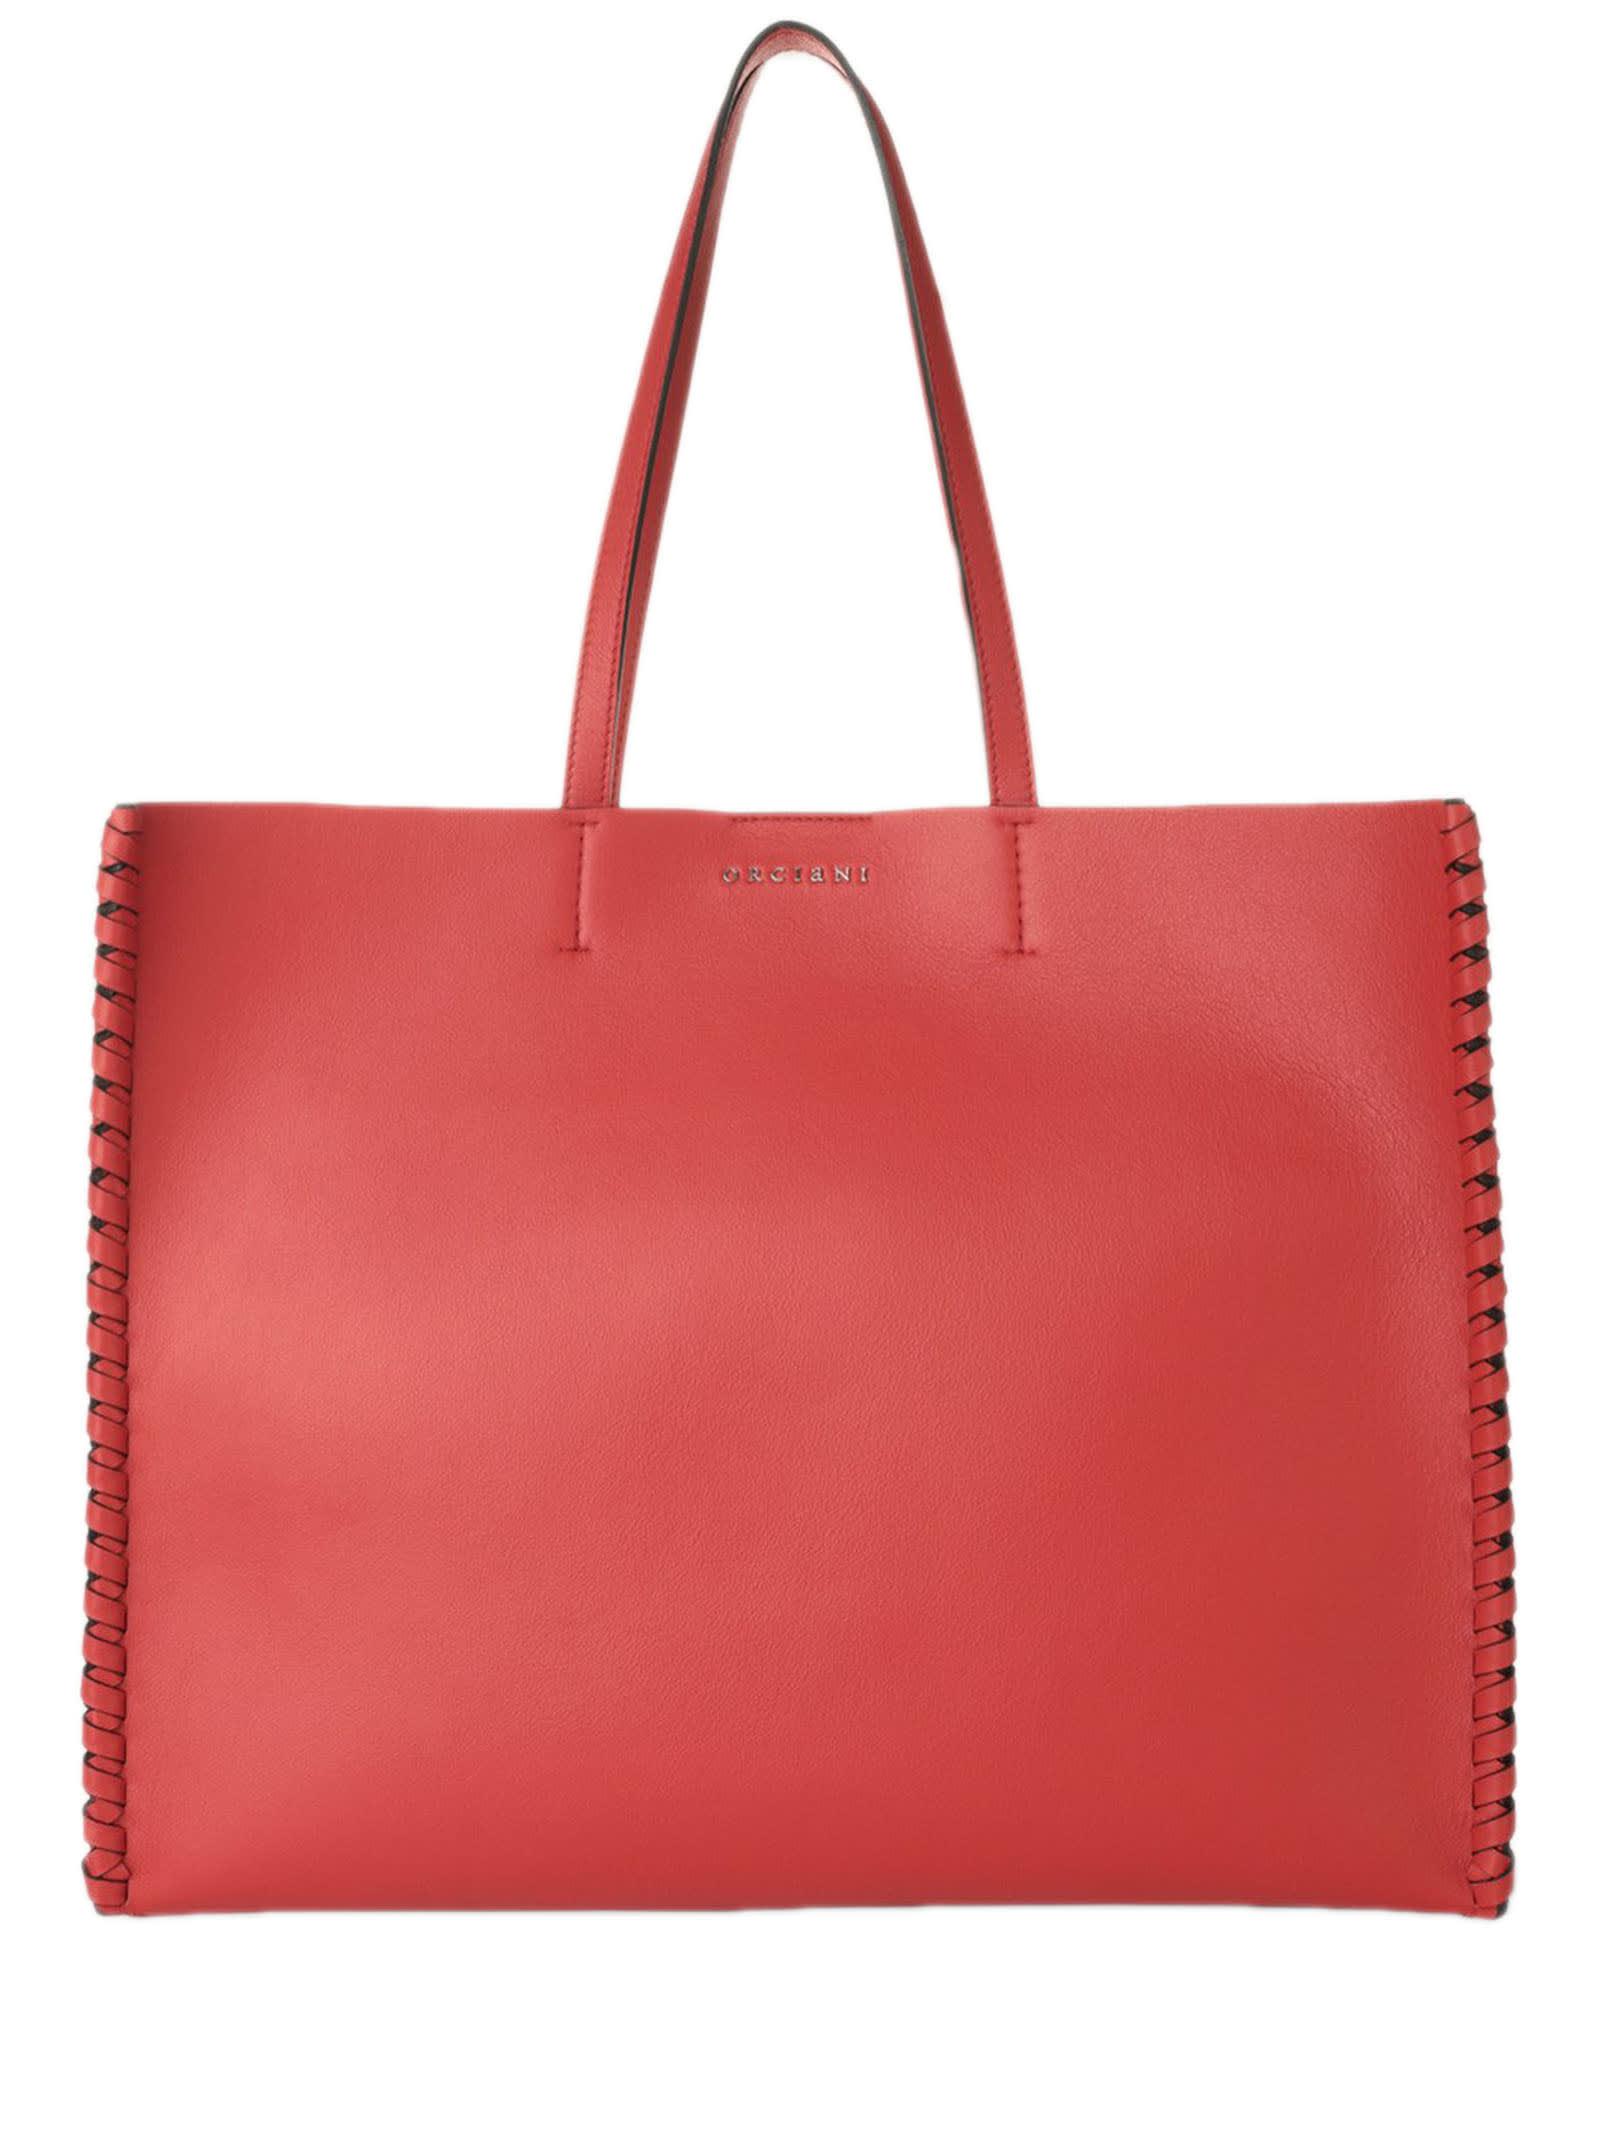 Orciani Le Sac Liberty Mesh Red Tote Bag